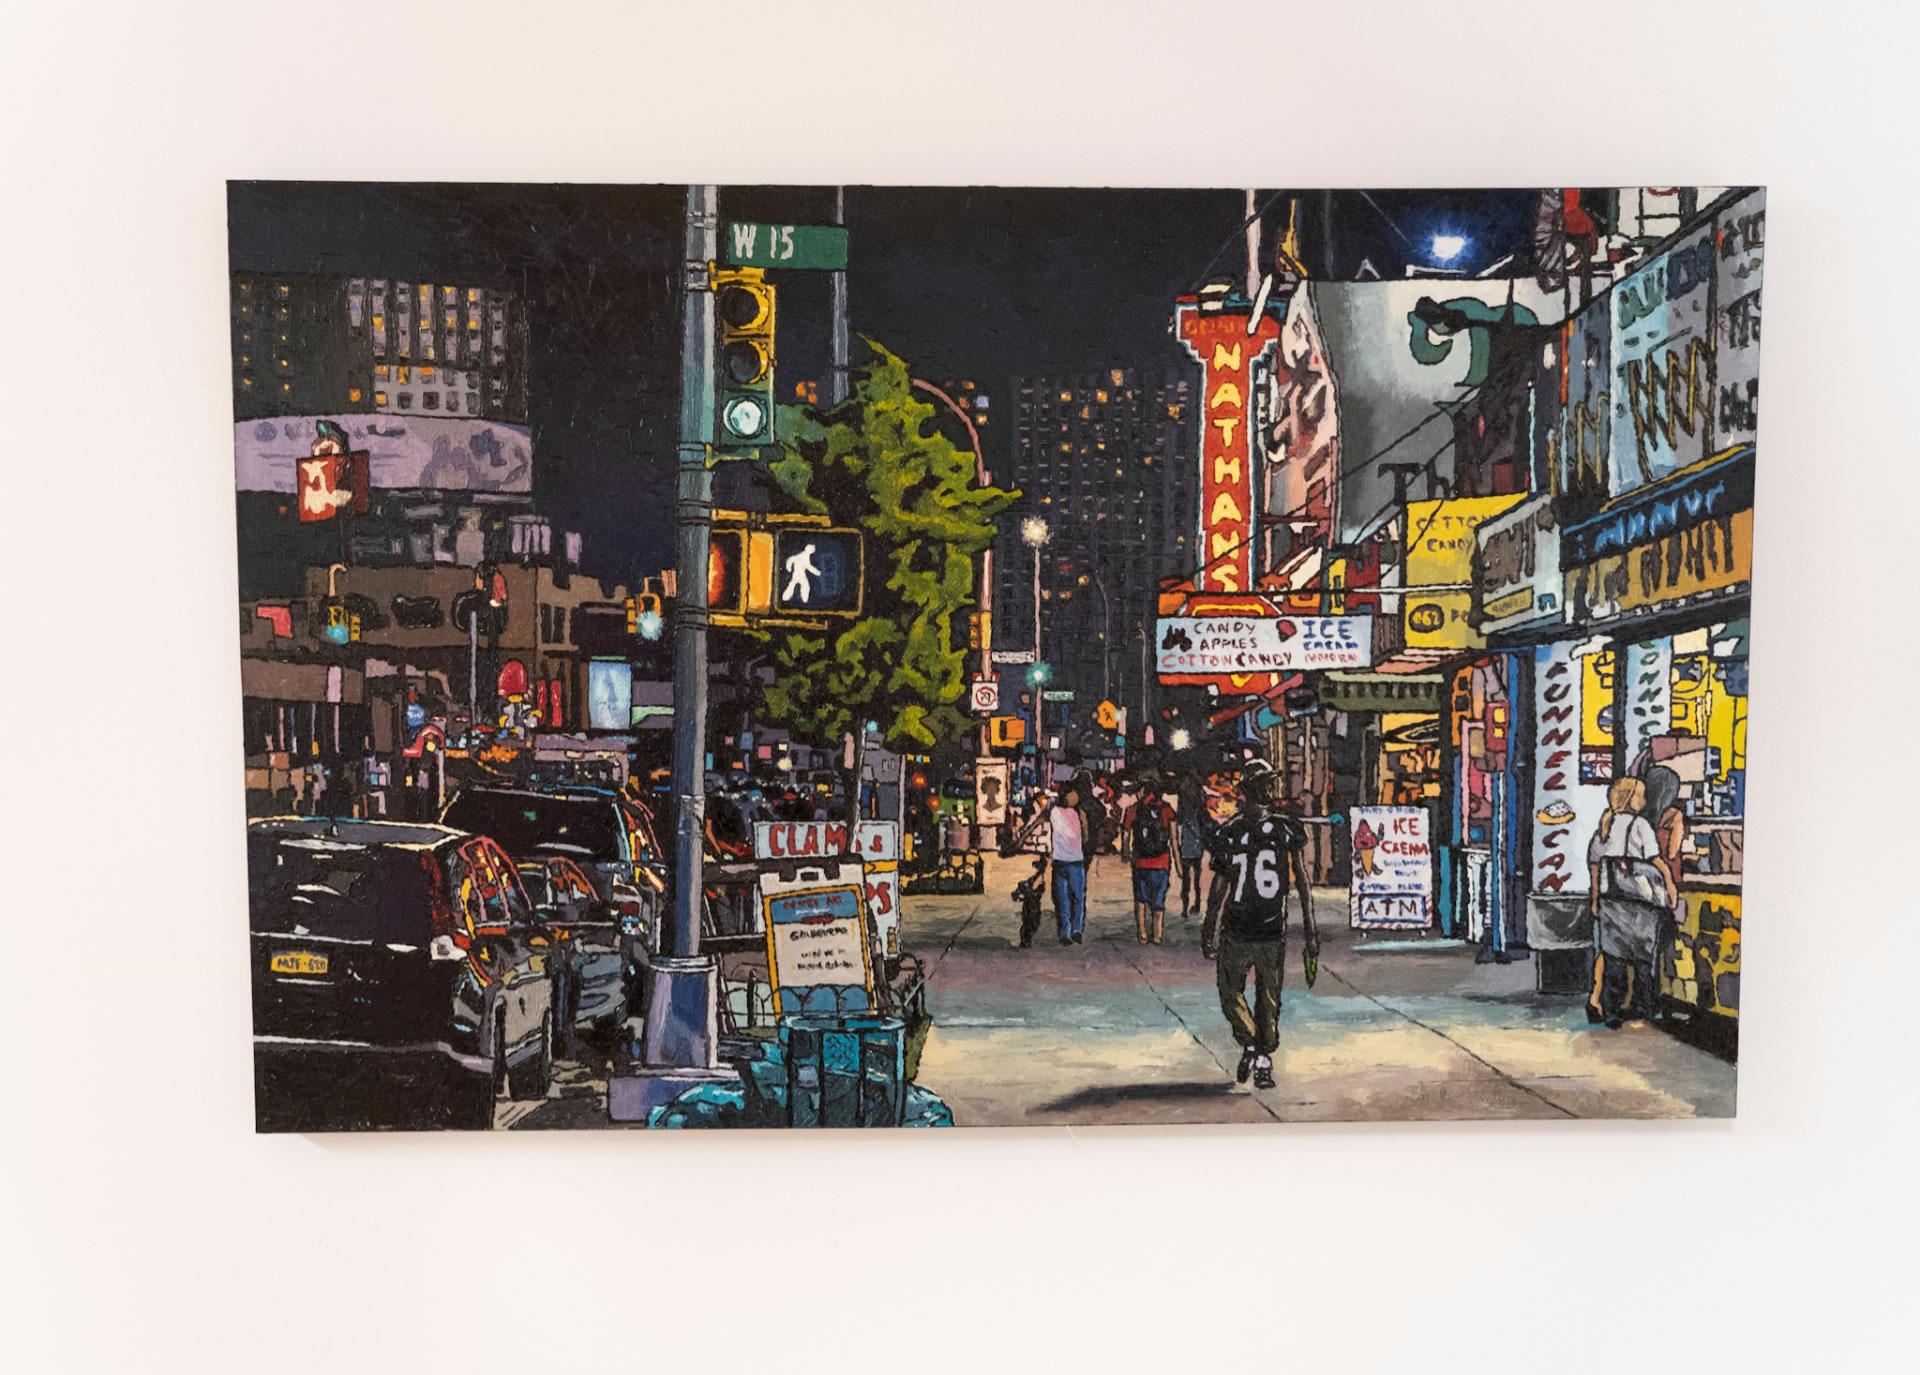 Emilie-Fantuz-Through-The-Streets-oil-on-canvas-30x48-2020-3900-Front-Online-Art-Galleries